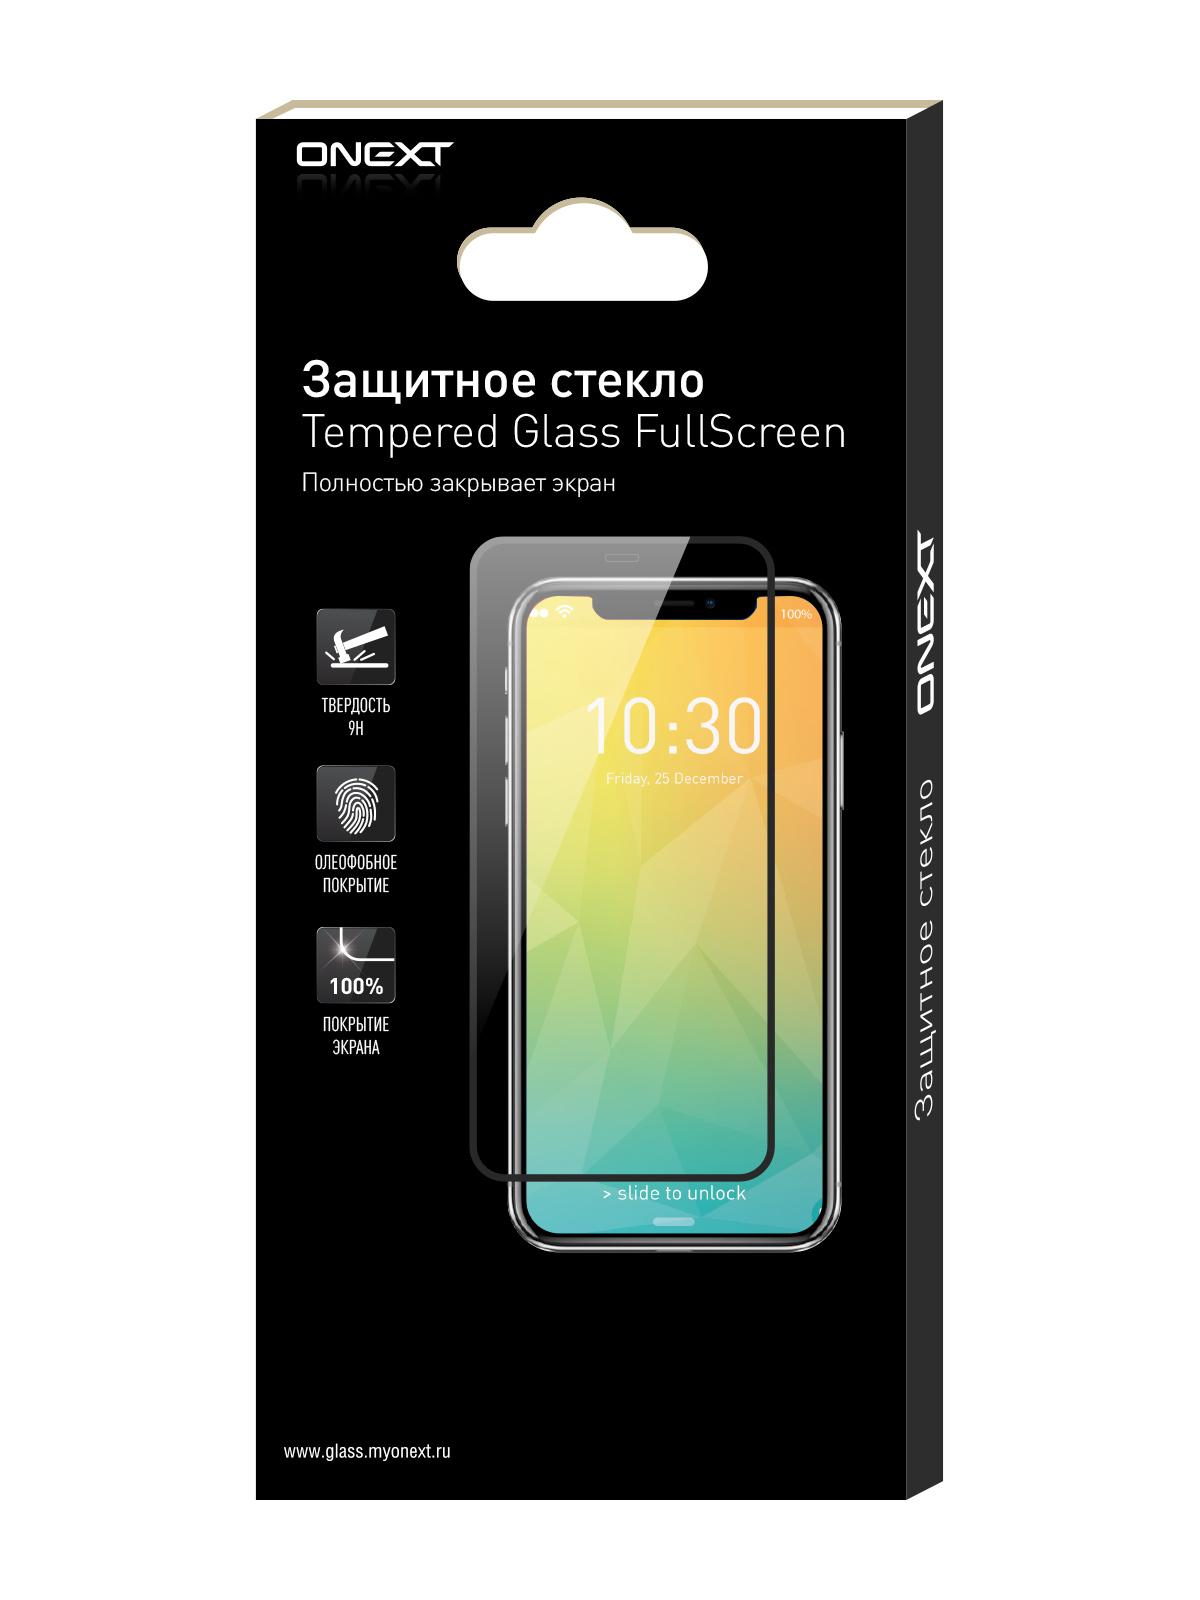 Защитное стекло ONEXT для Apple iPhone 7 Black